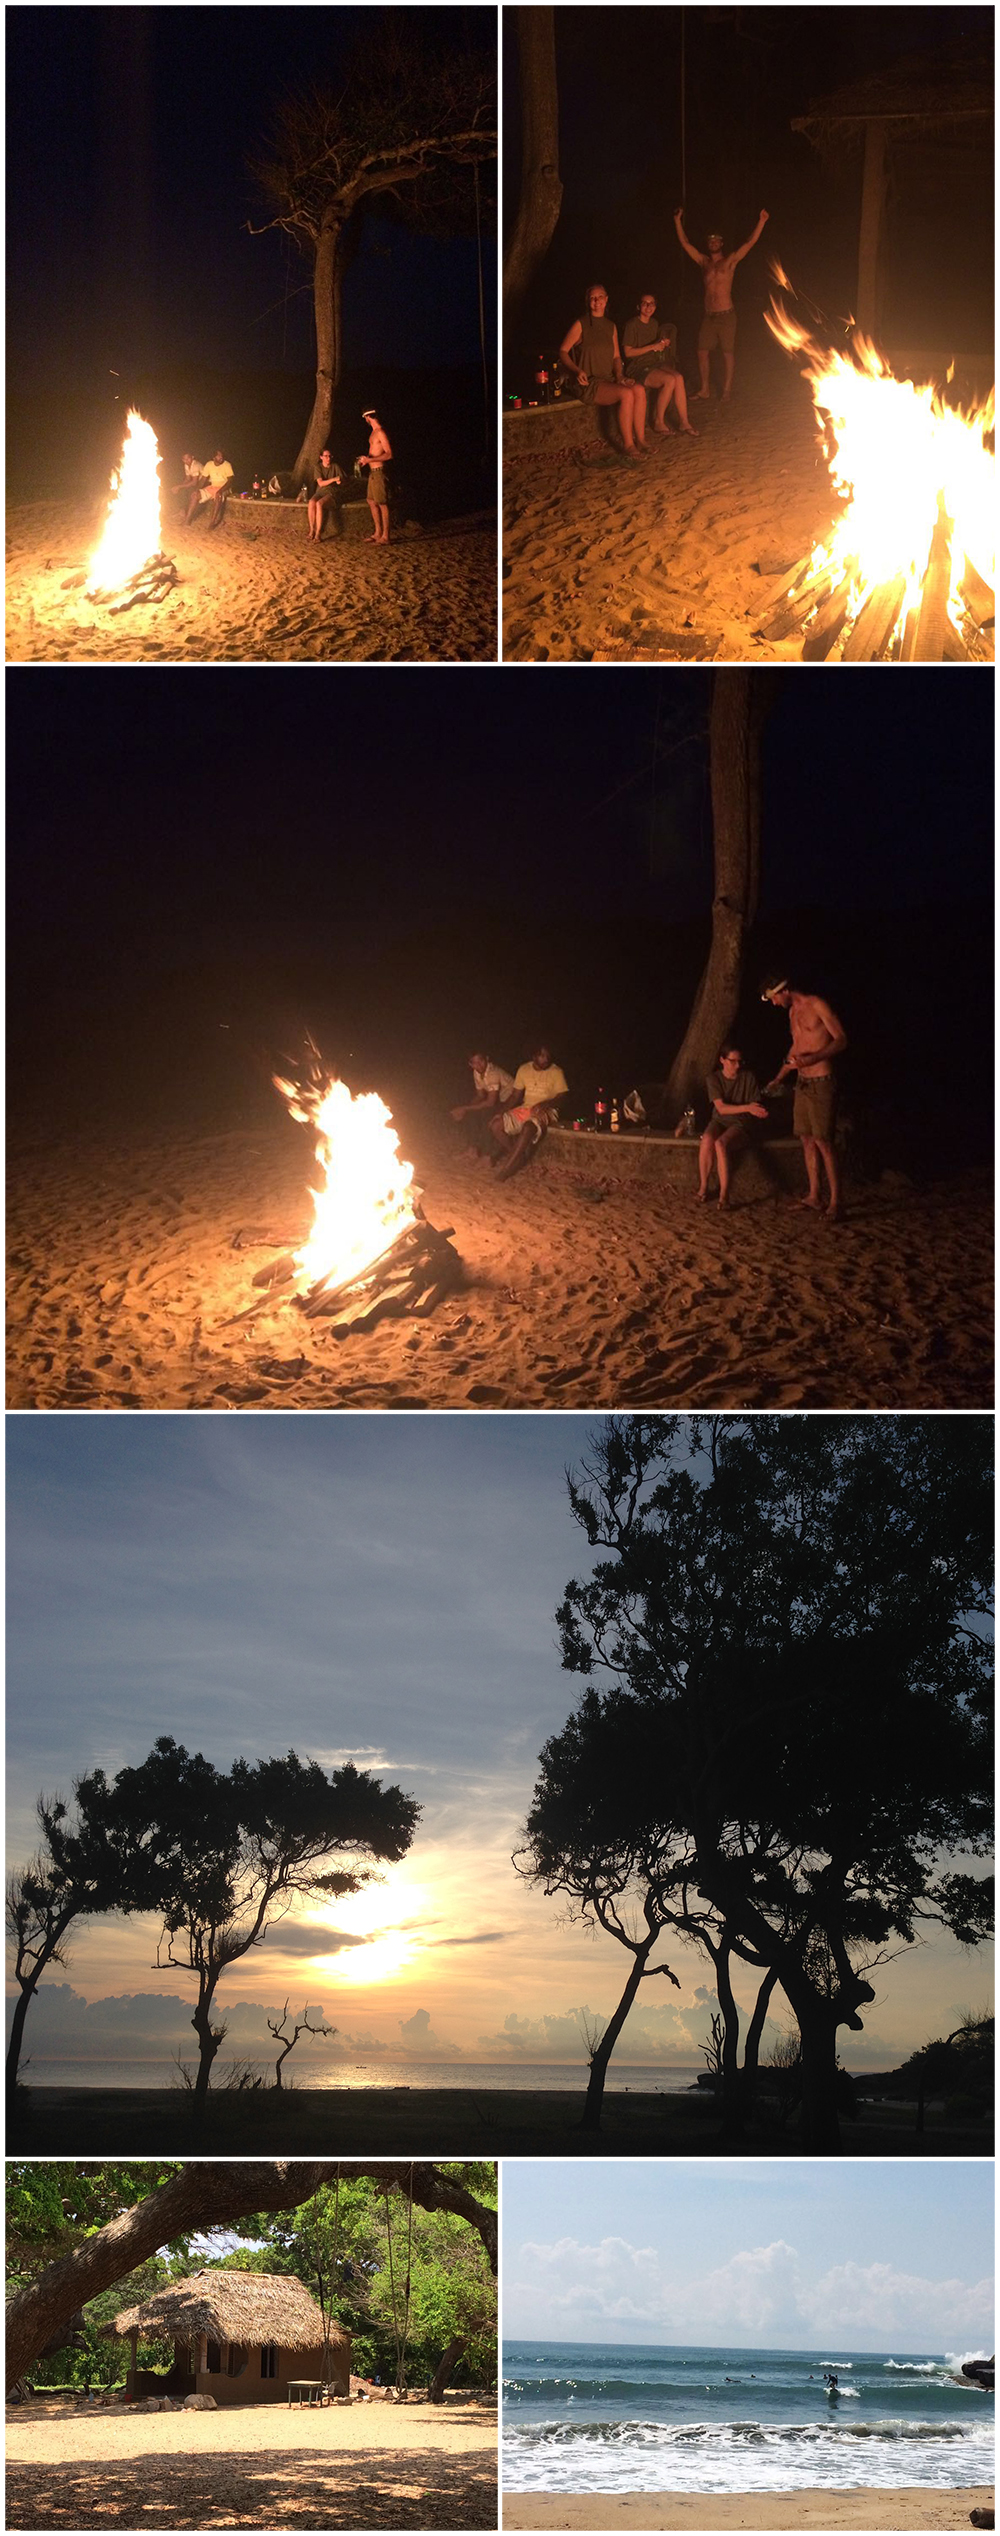 Peanut farm Camping and surf Sri Lanka